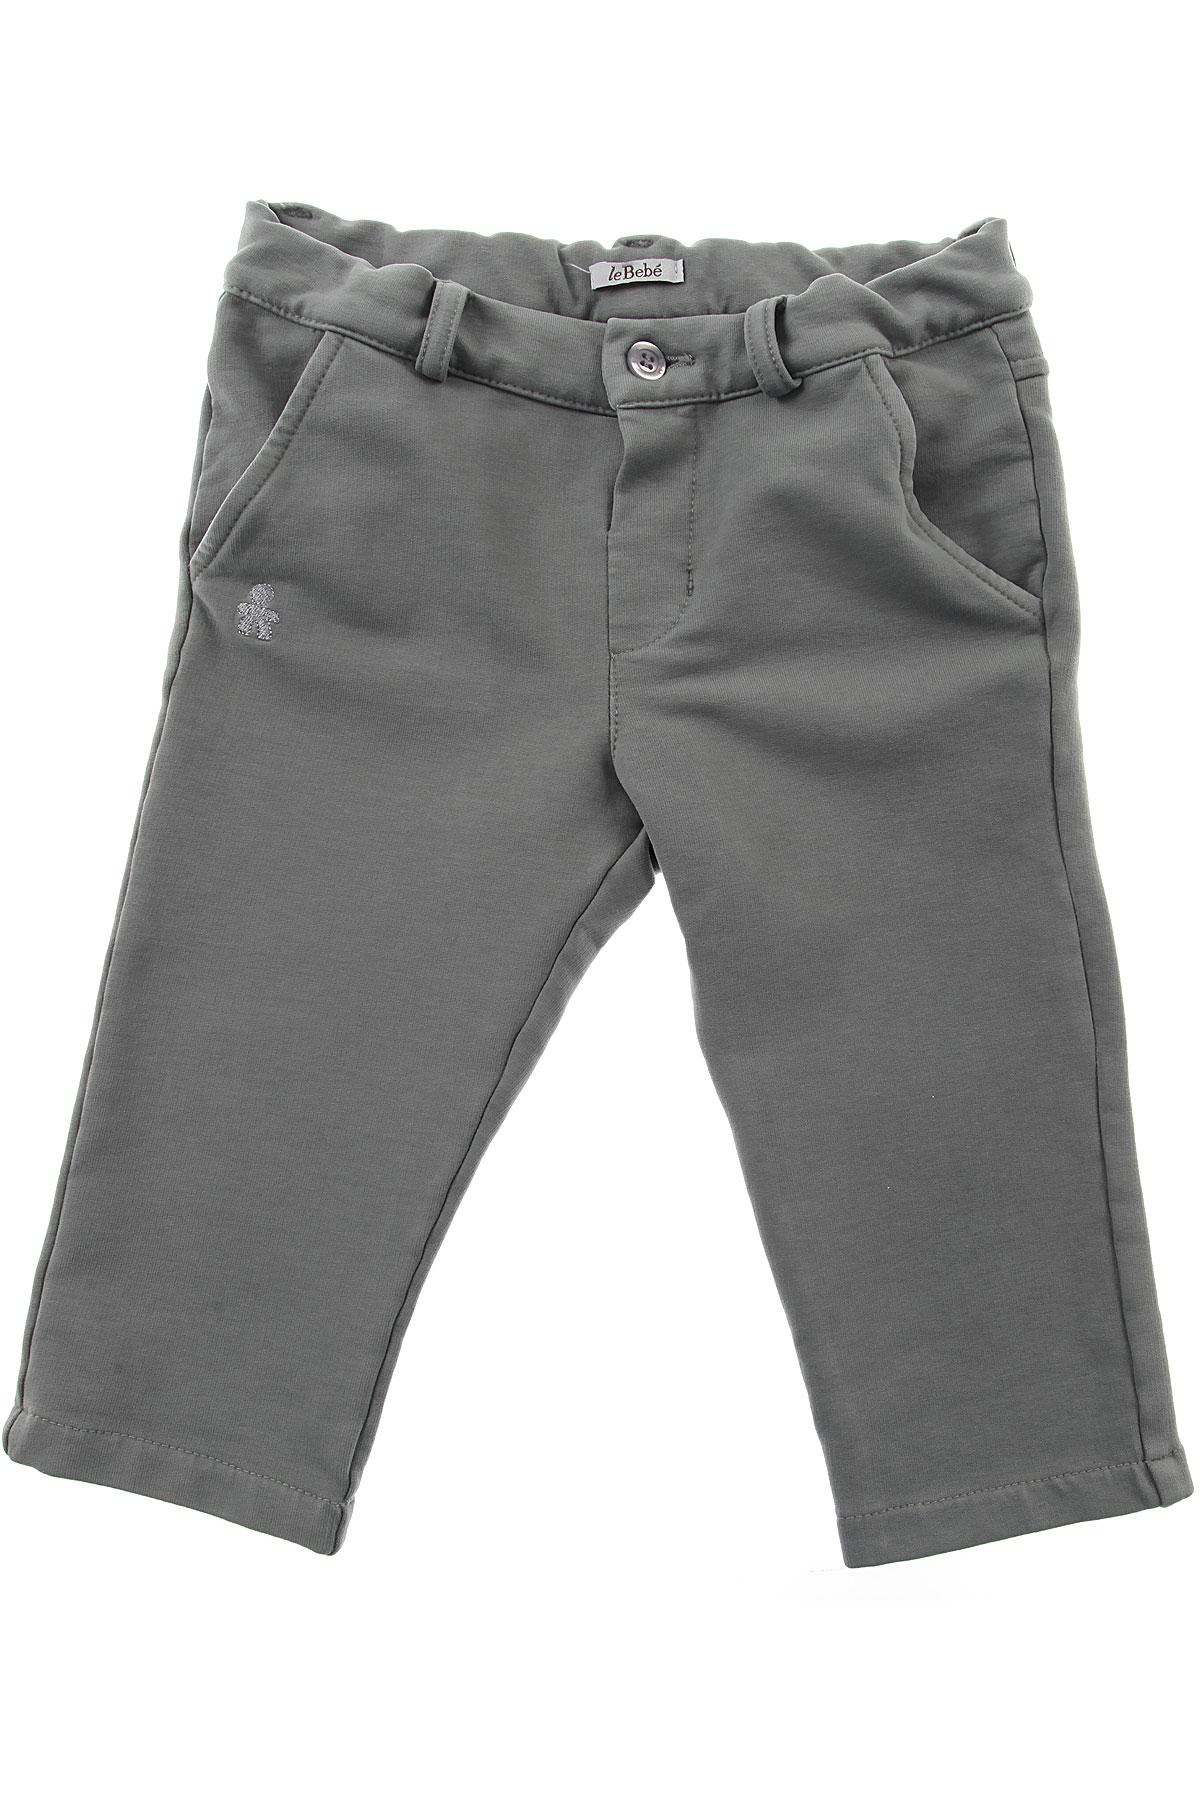 Image of Le Bebe Baby Pants for Boys, Grey, Cotton, 2017, 12M 18M 3M 6M 9M